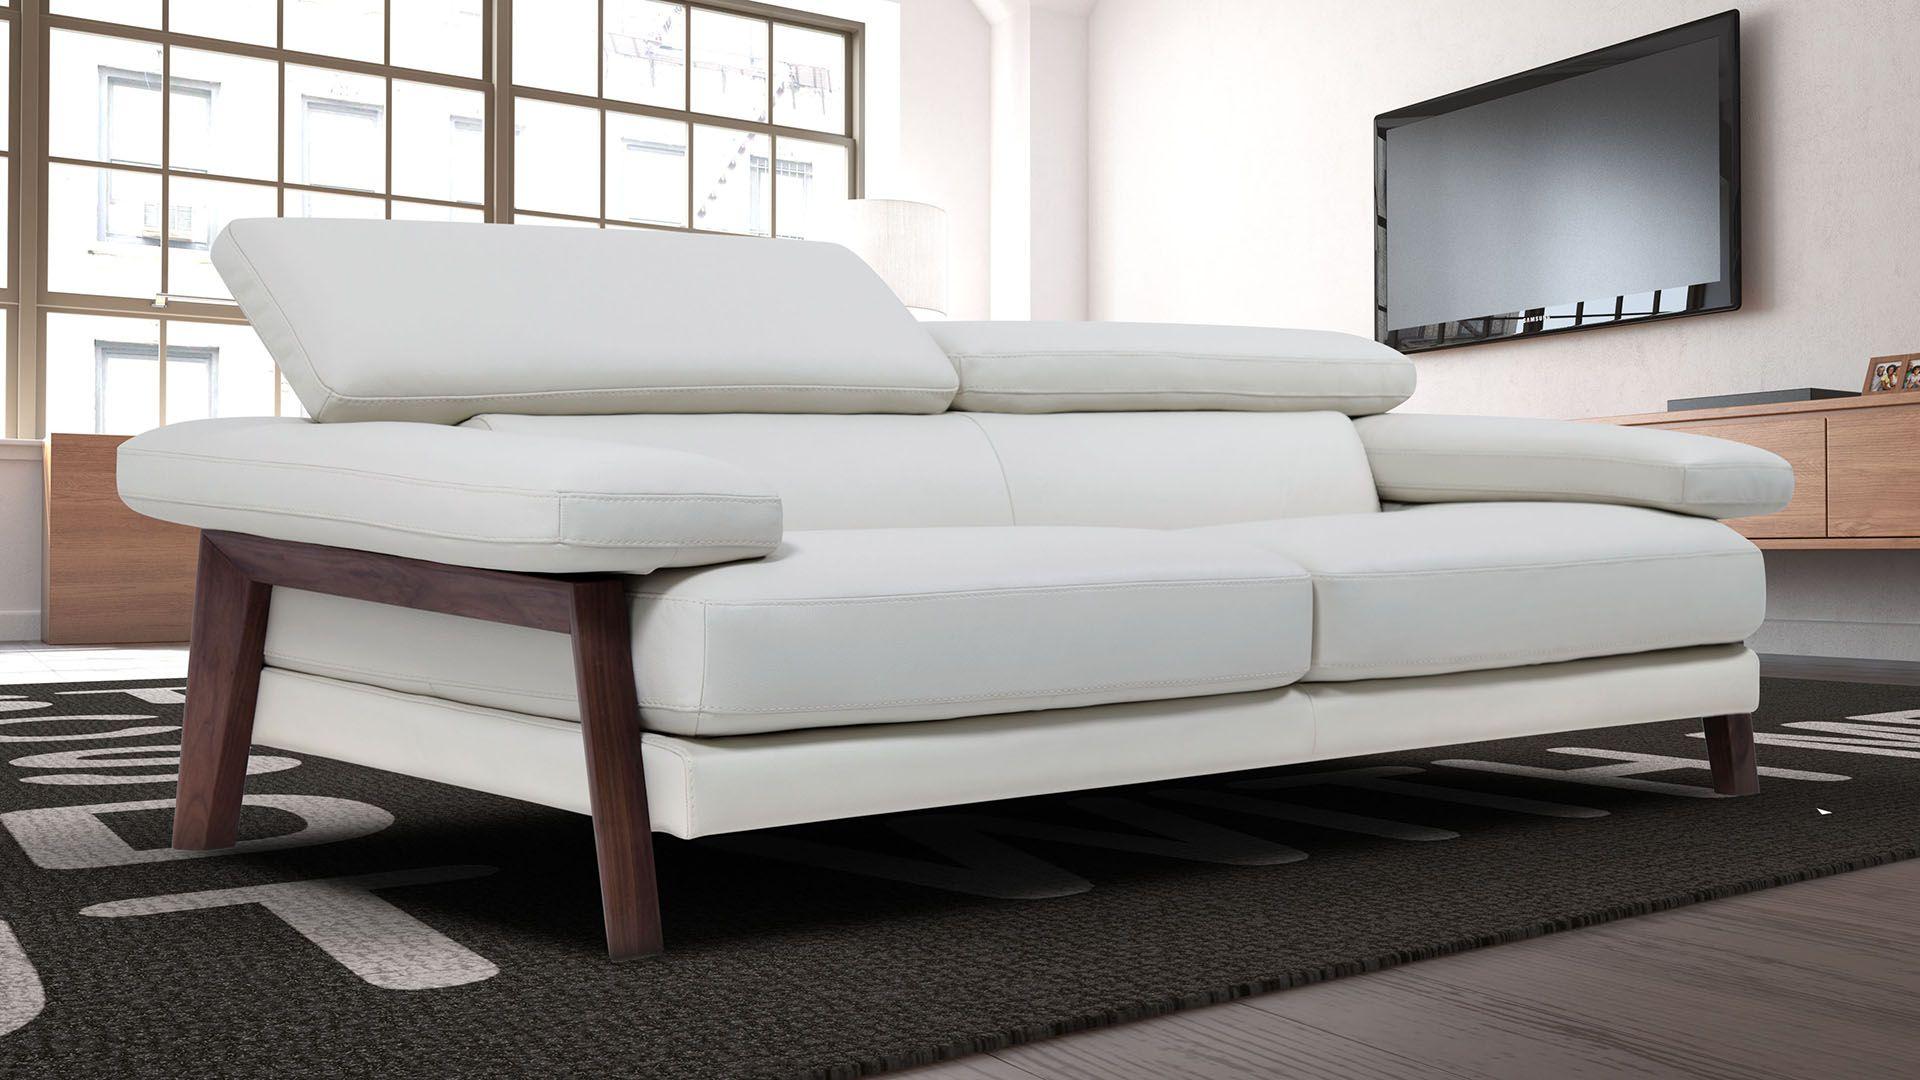 Modello eros bianco divani bianco white flag for Felice palma arredamenti